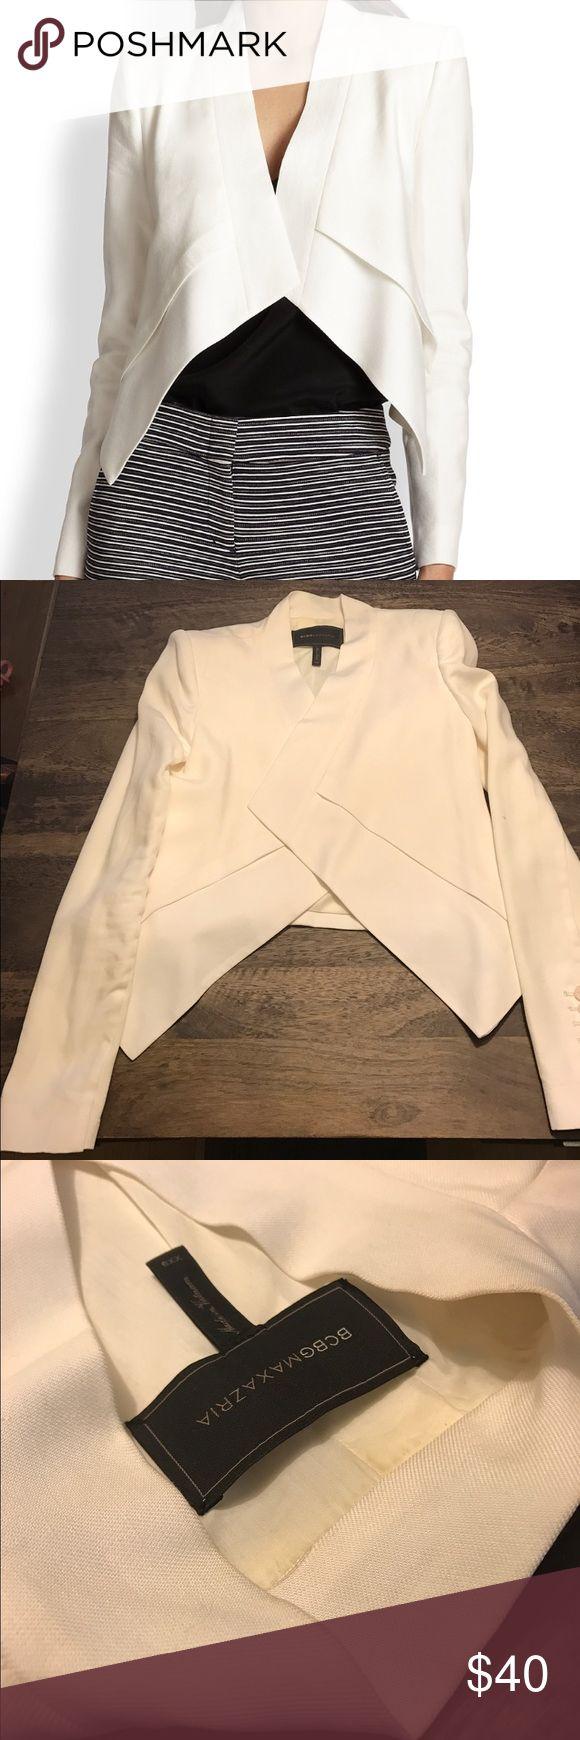 Bcbg max azria Lloyd blazer Size xxs. Never been worn. In perfect condition BCBGMaxAzria Jackets & Coats Blazers